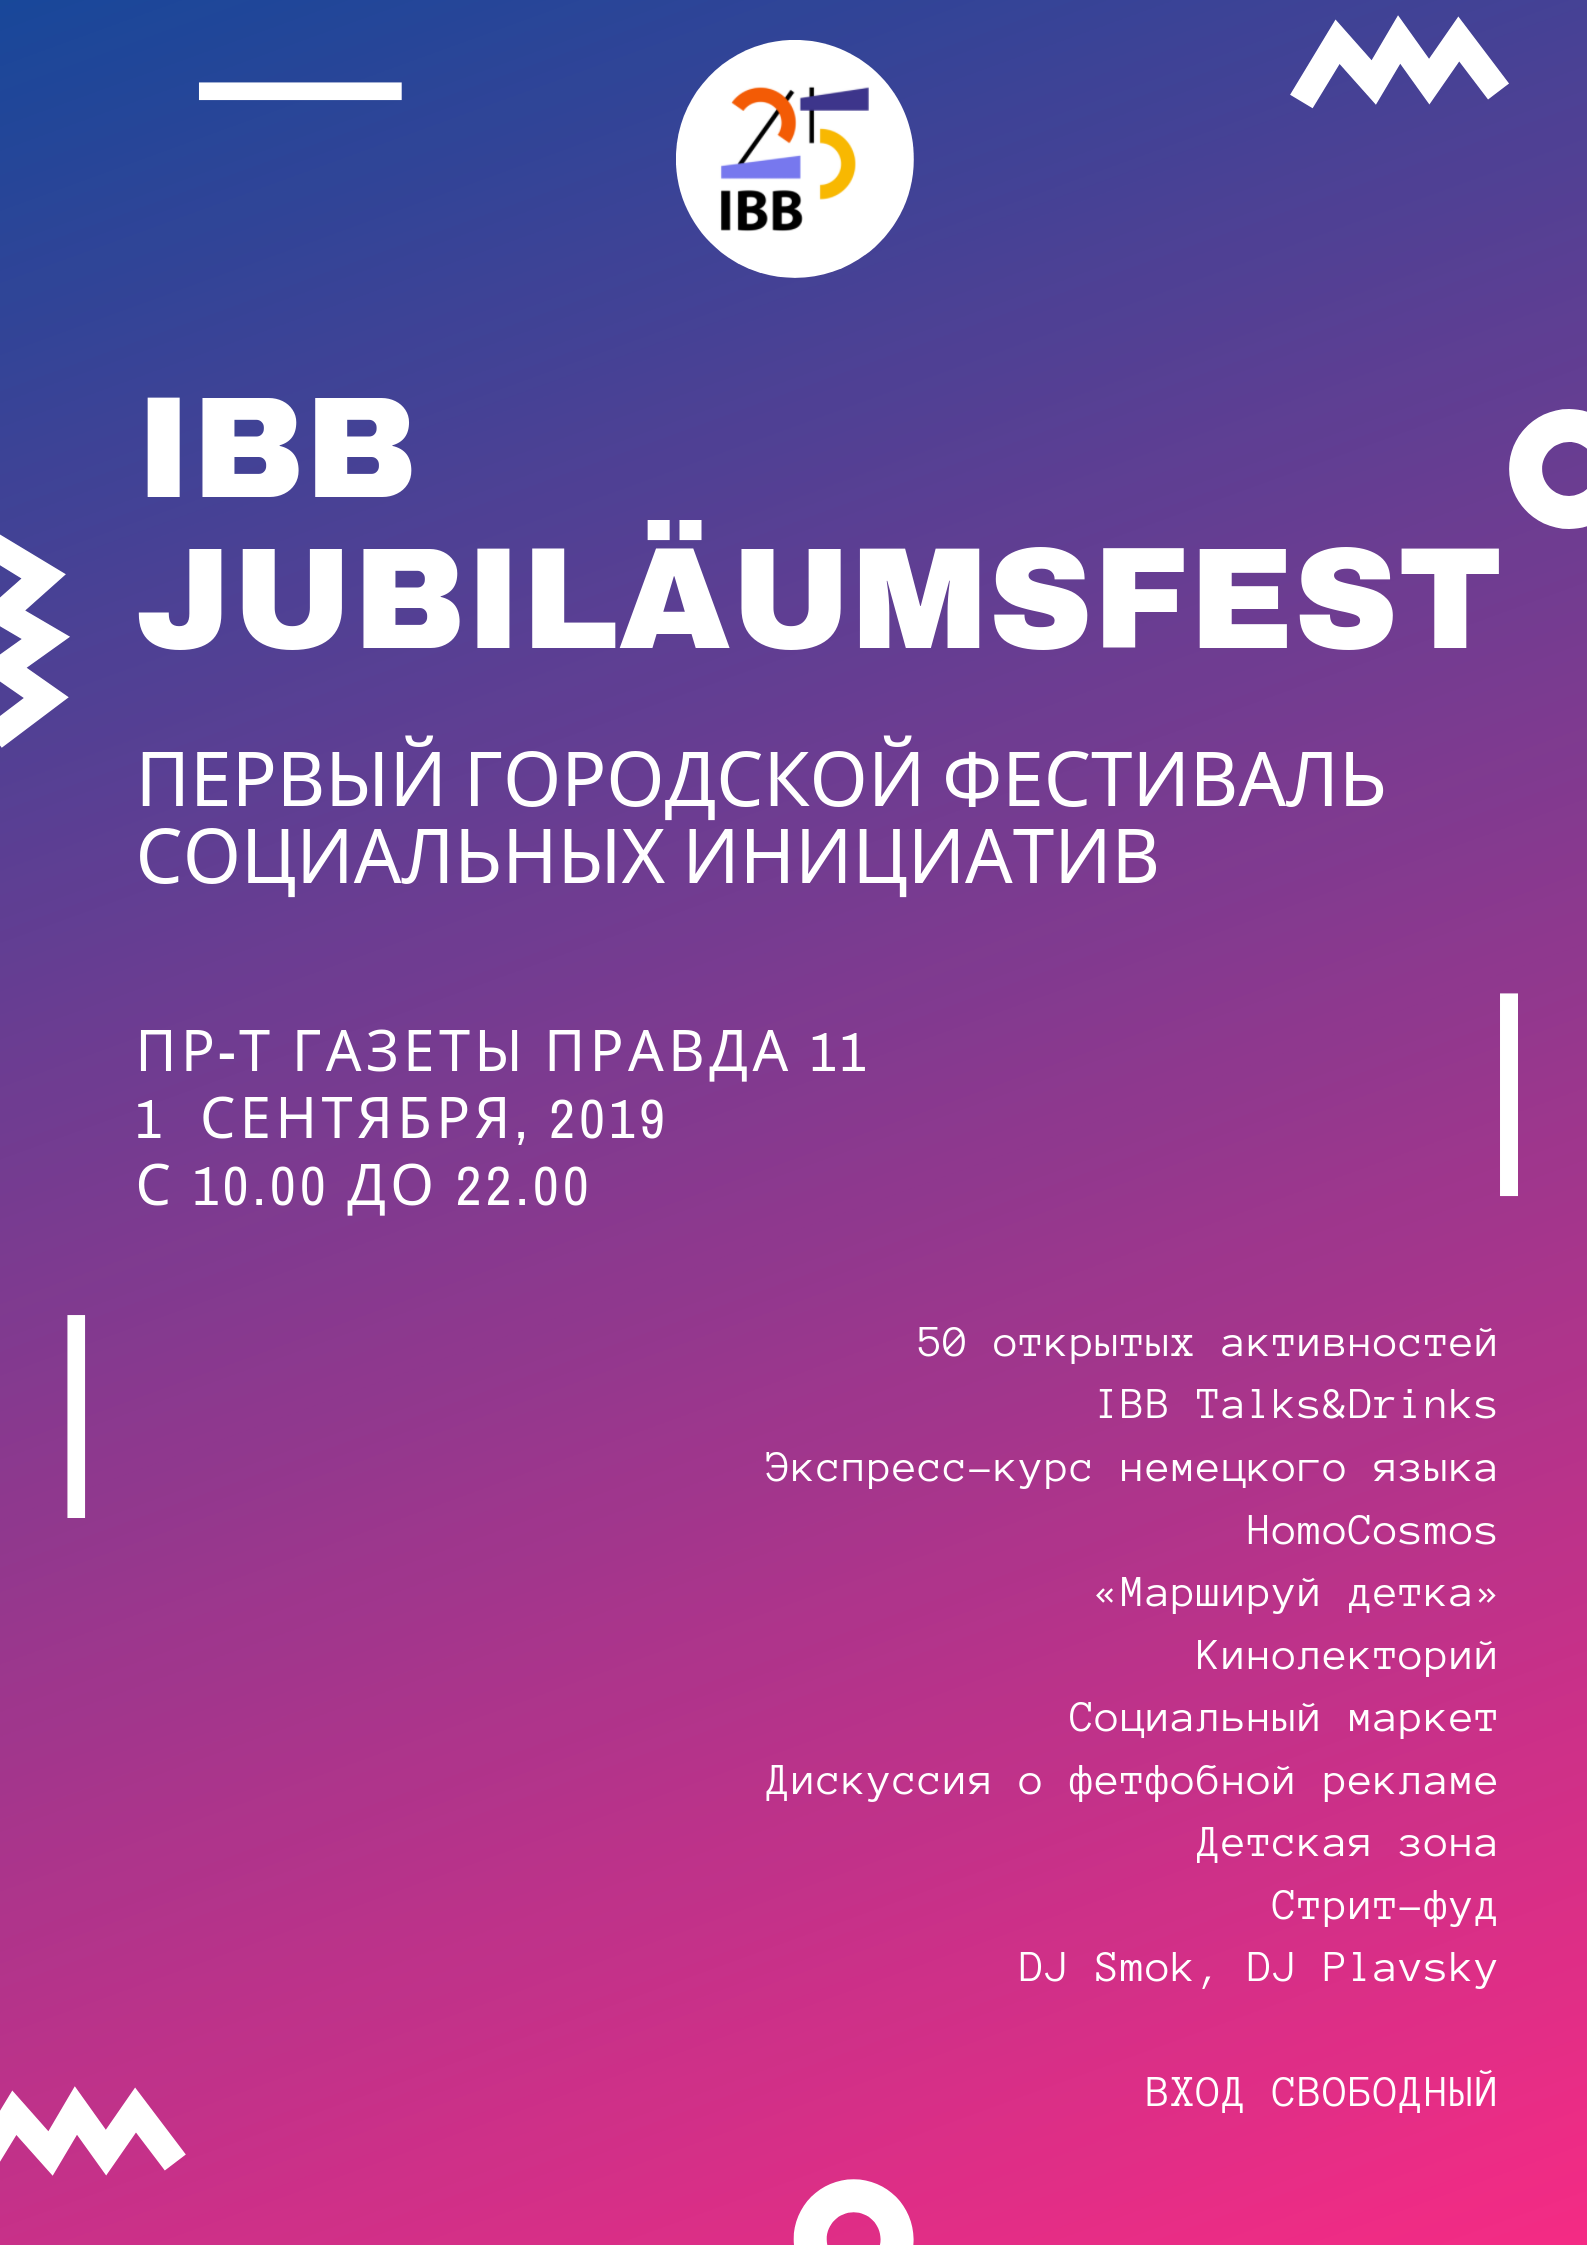 IBB JubilaumsFest, копия, коп?? (1)-1